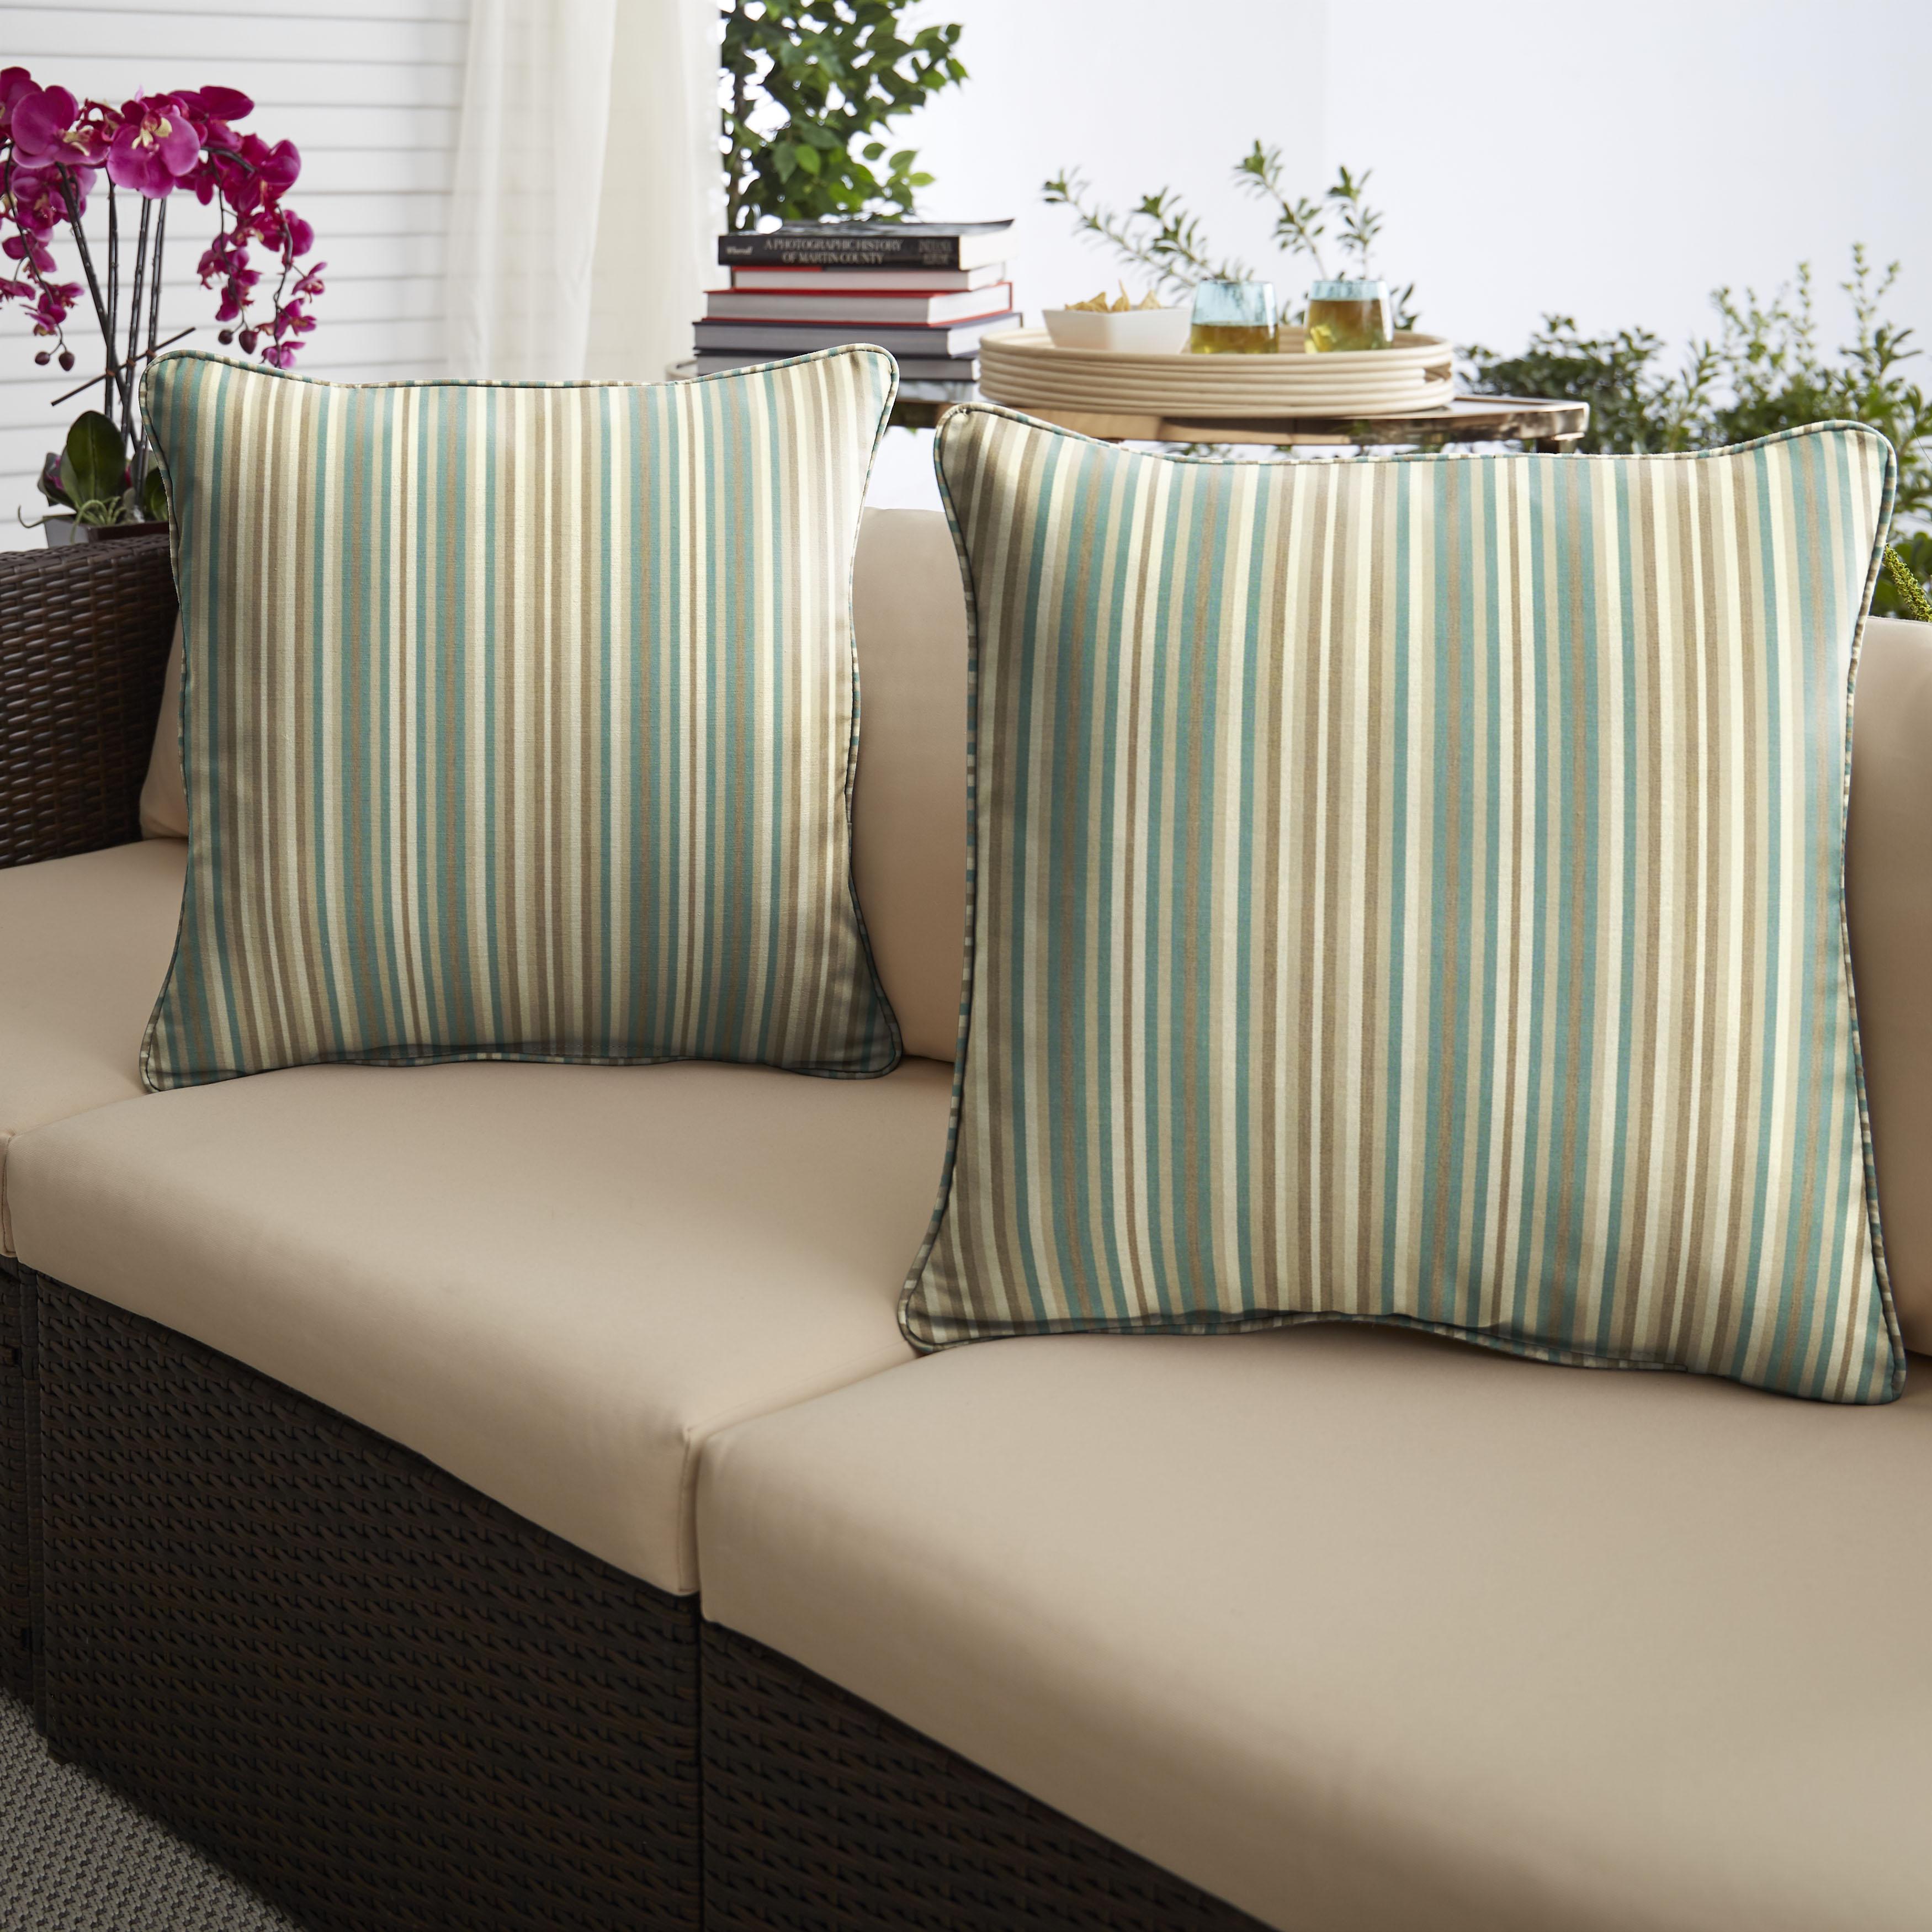 Sunbrella Gavin Mist Set of 2 Outdoor Pillows